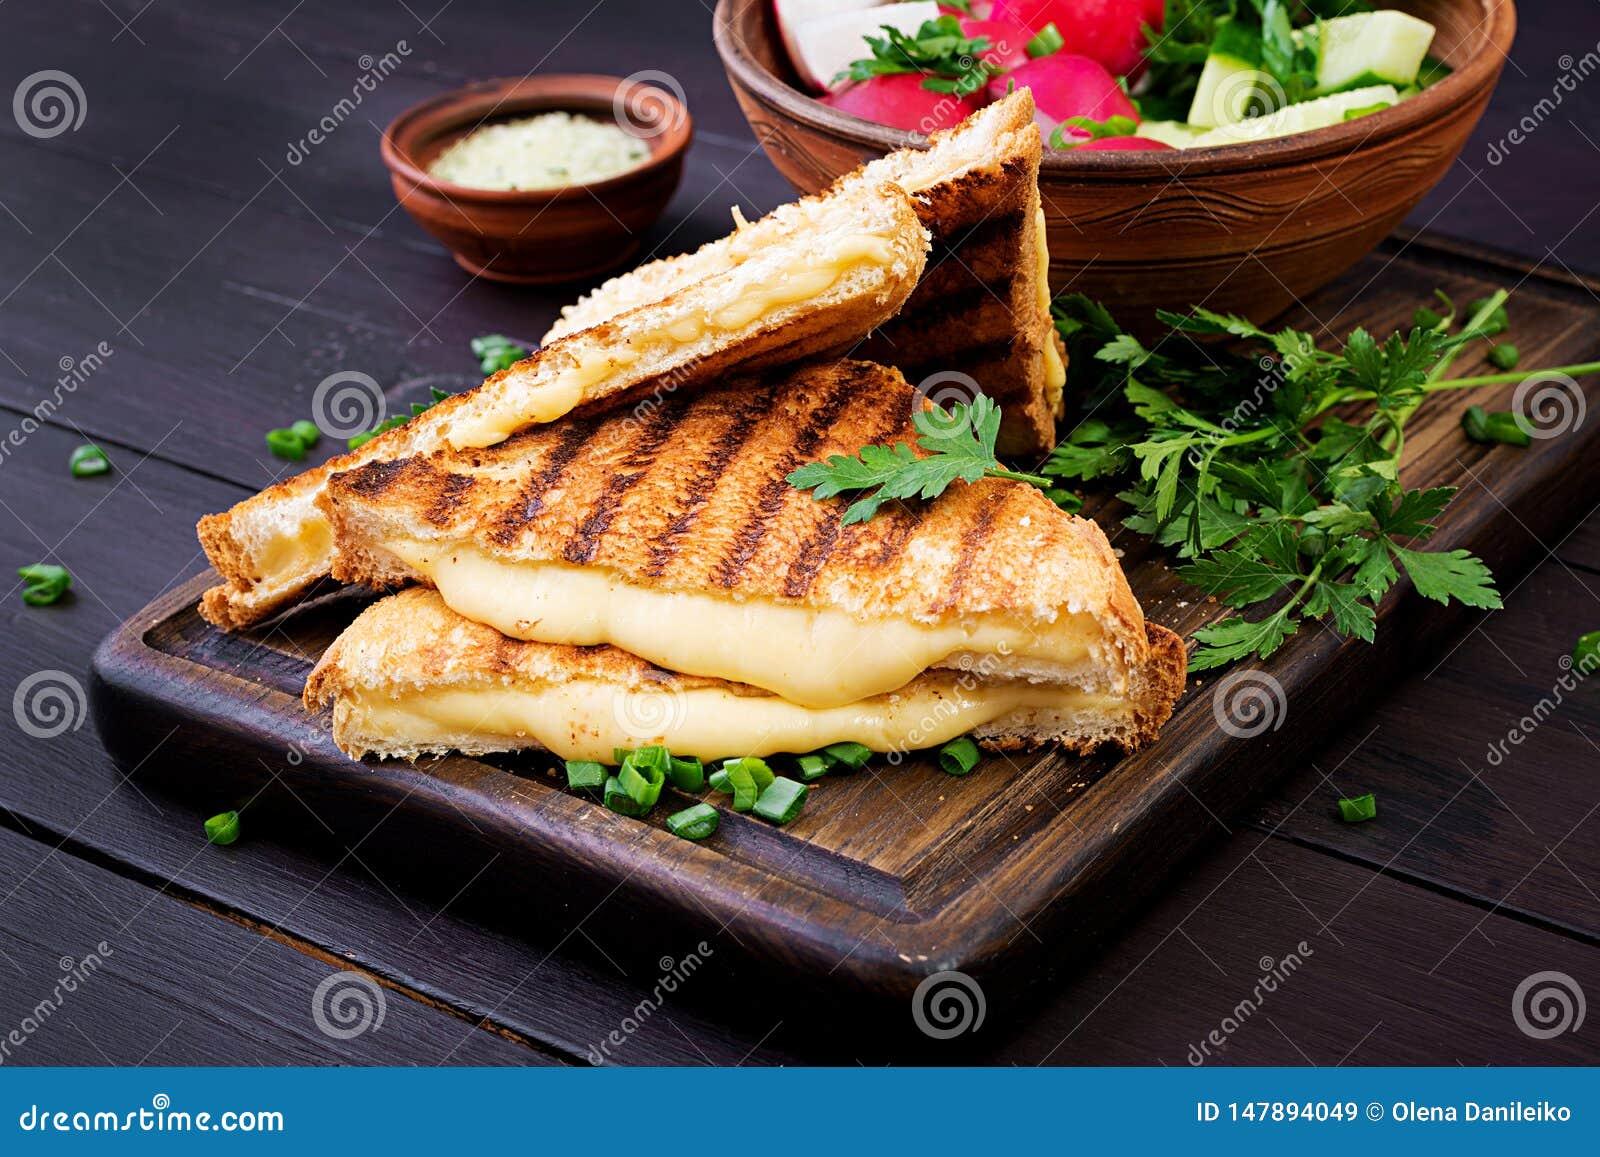 Sandwich chaud am?ricain ? fromage Sandwich grill? fait maison ? fromage